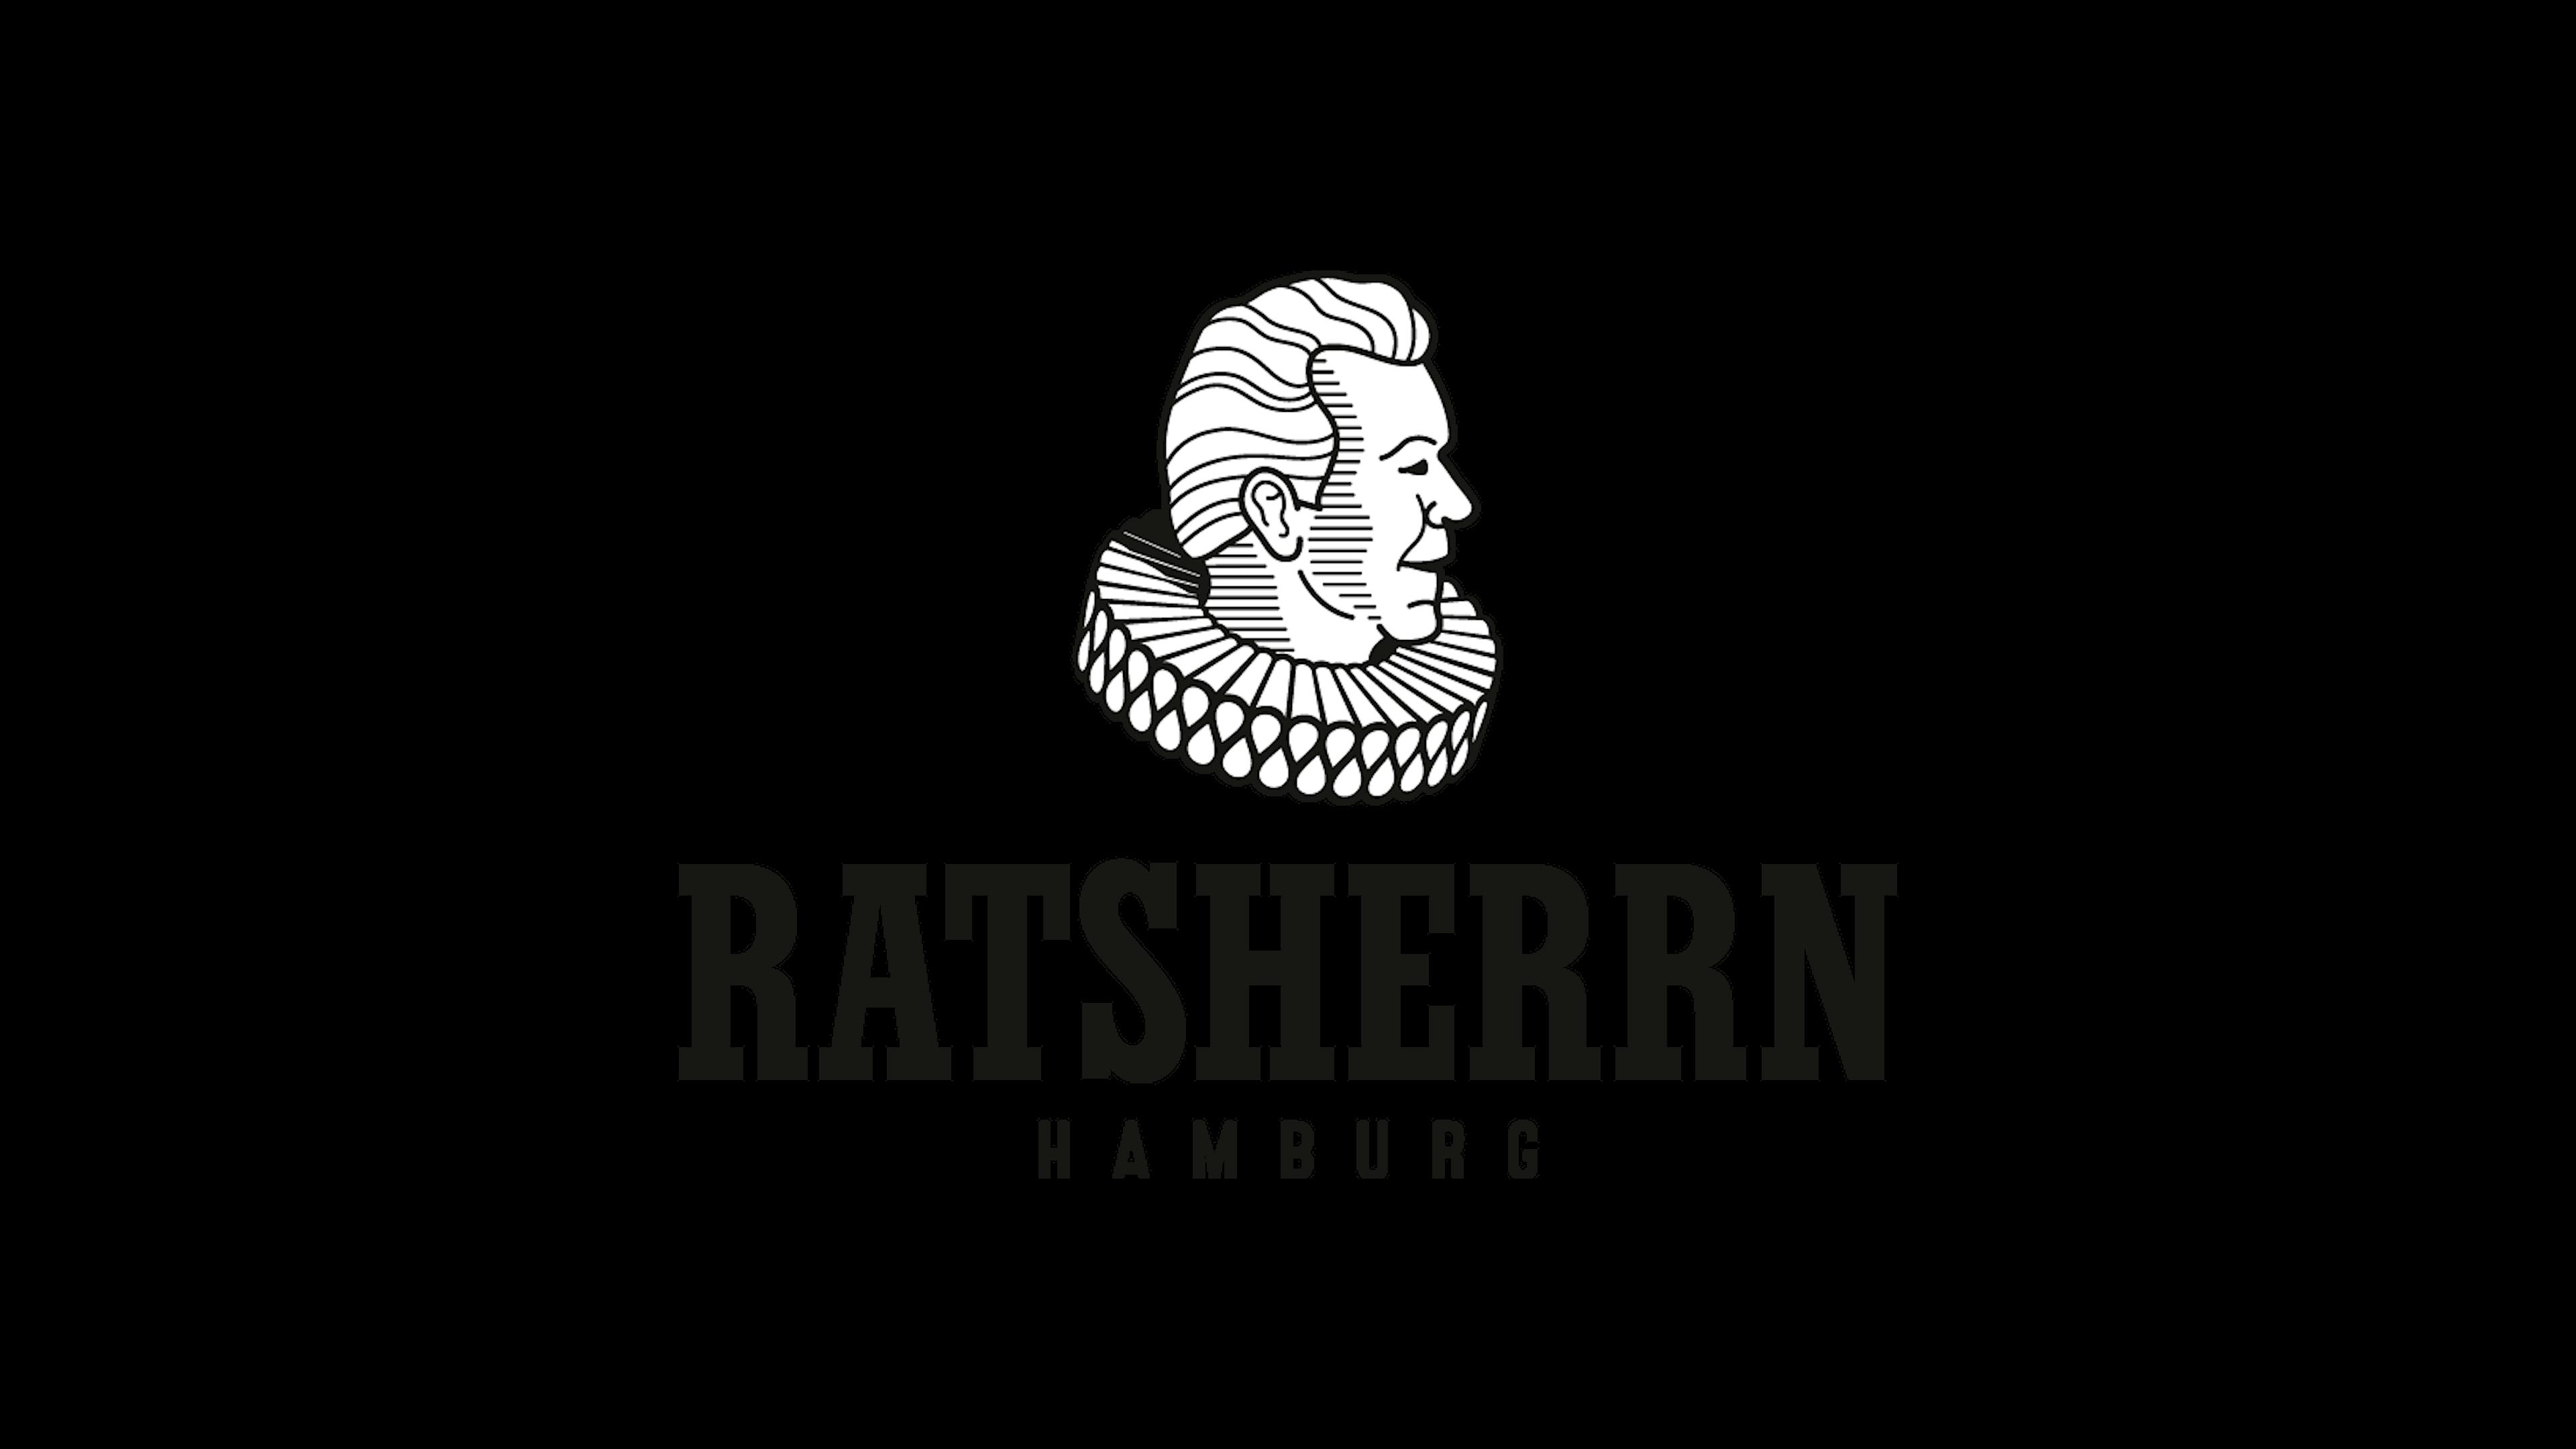 Ratsherrn Brauerei Logo Benjamin Lehmann